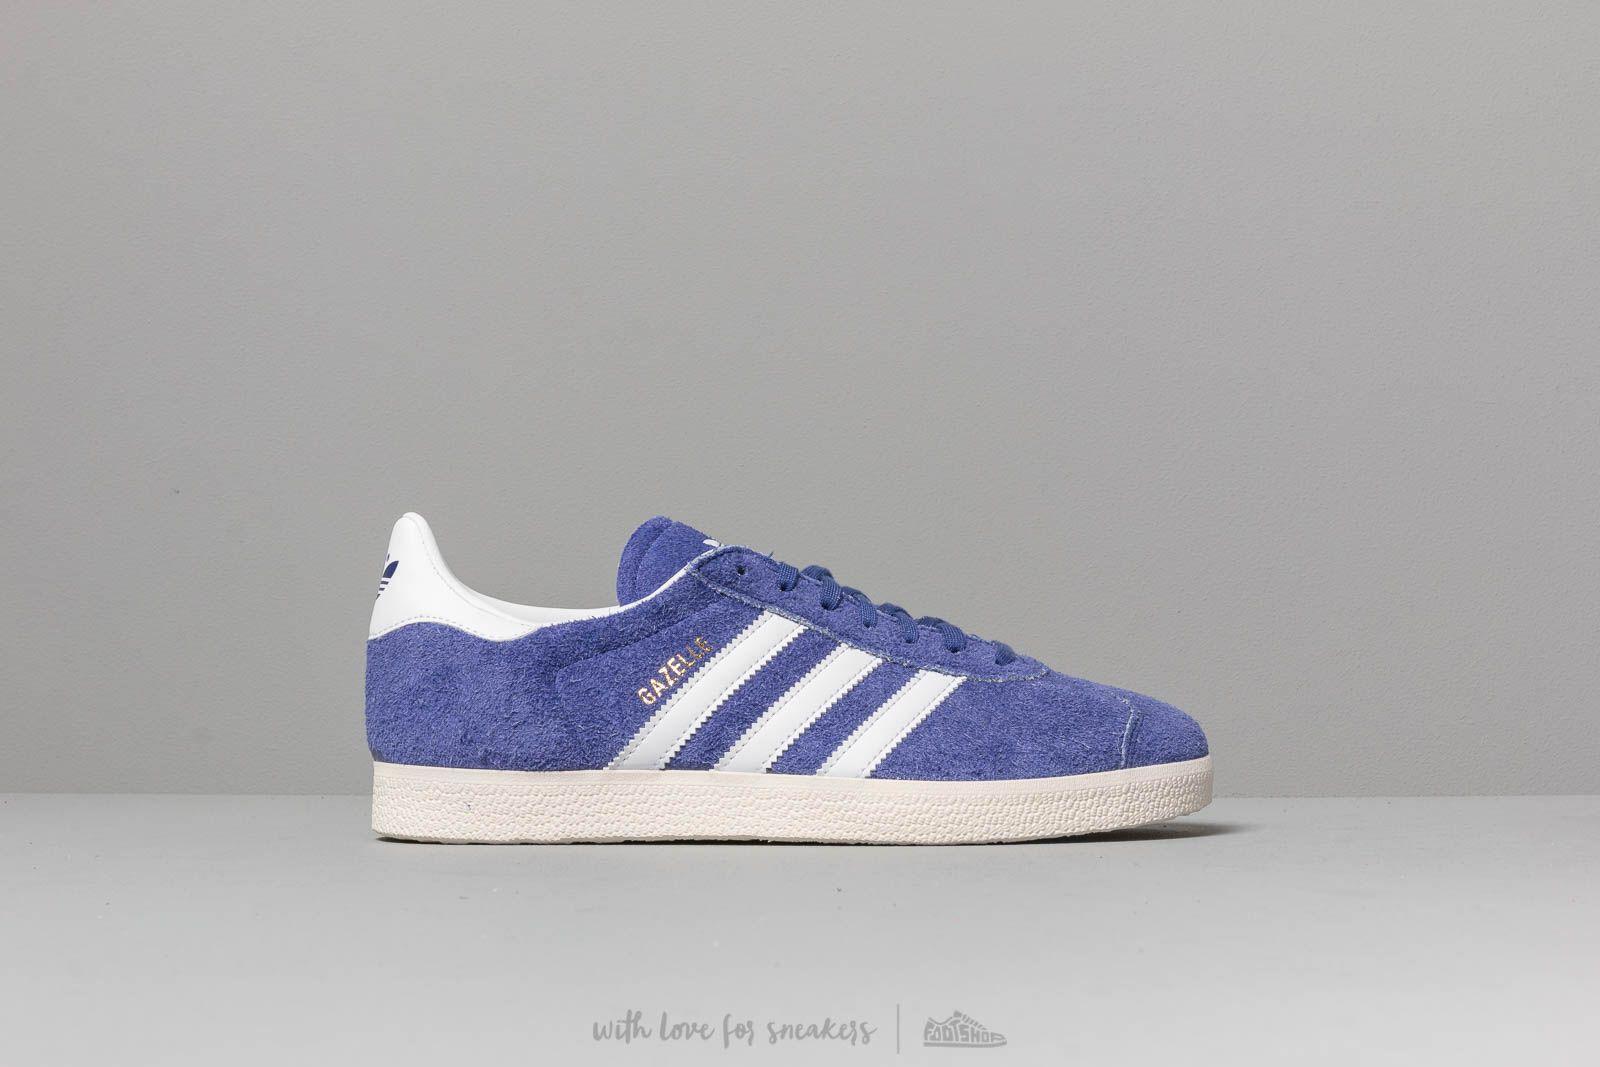 30c3c91d7 ... Adidas Gazelle Active Blue  Ftw White  Off White for Men. View  fullscreen